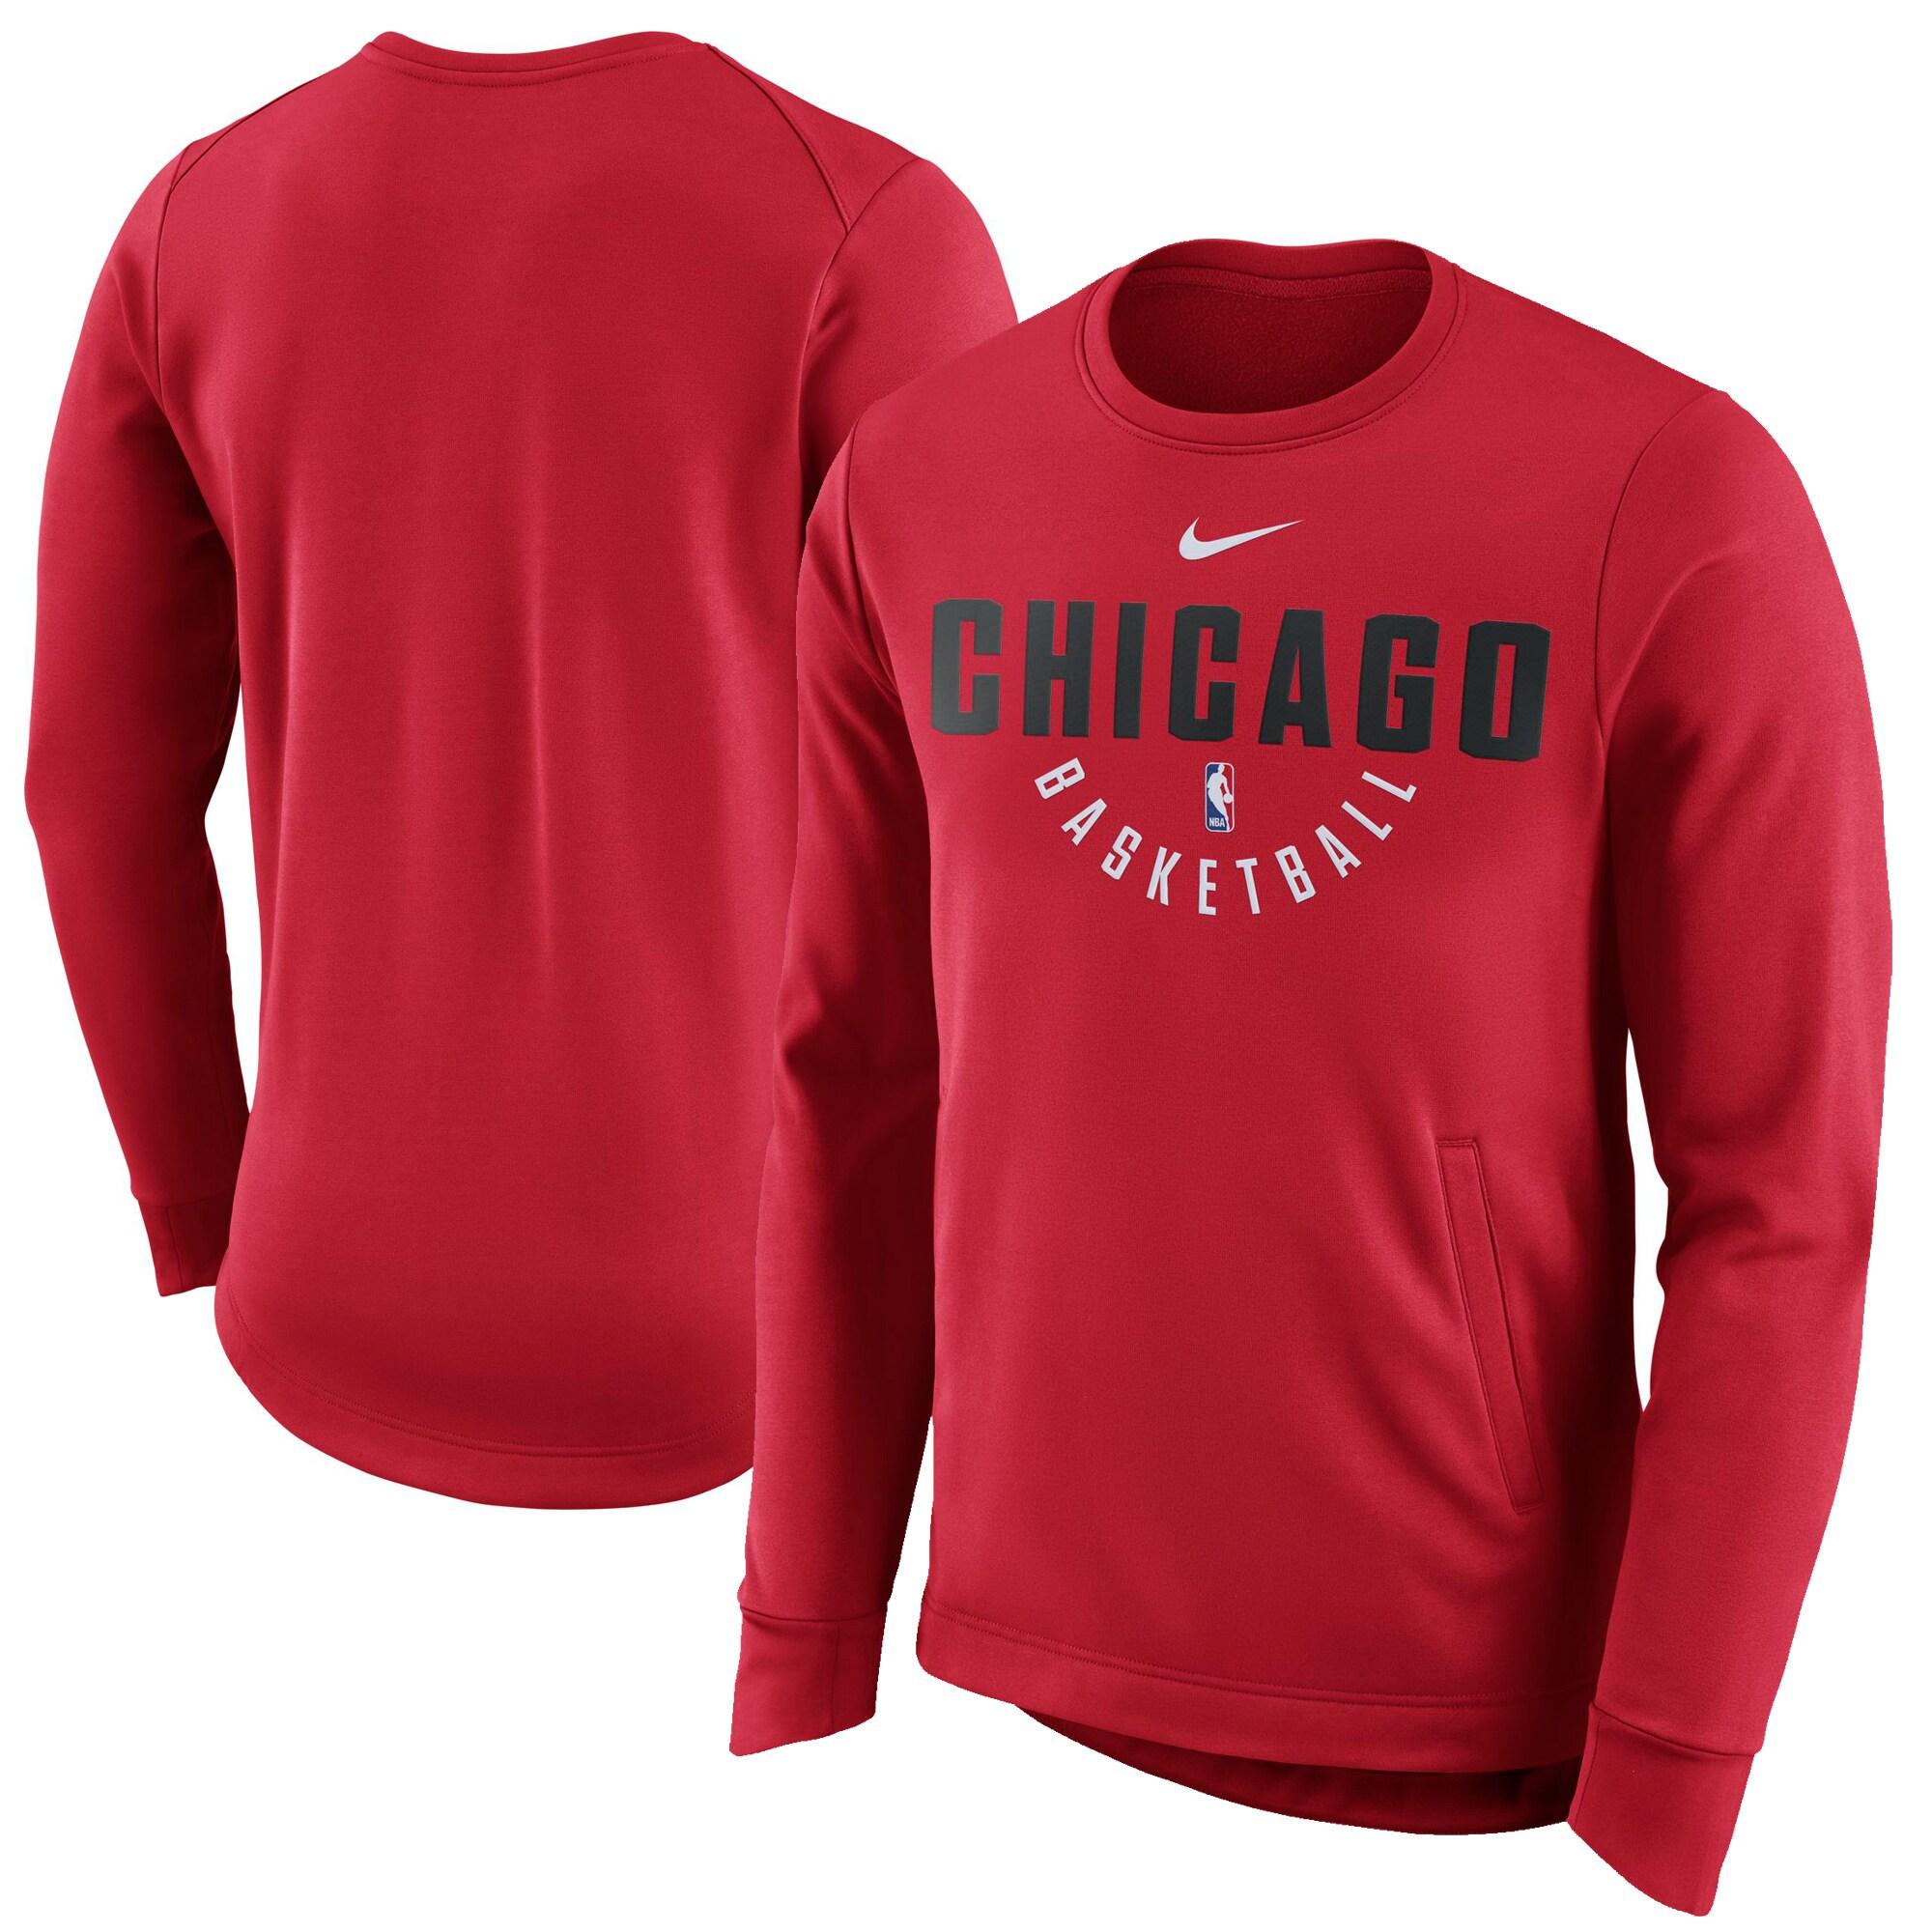 Chicago Bulls Nike Practice Fleece Performance Sweatshirt - Red